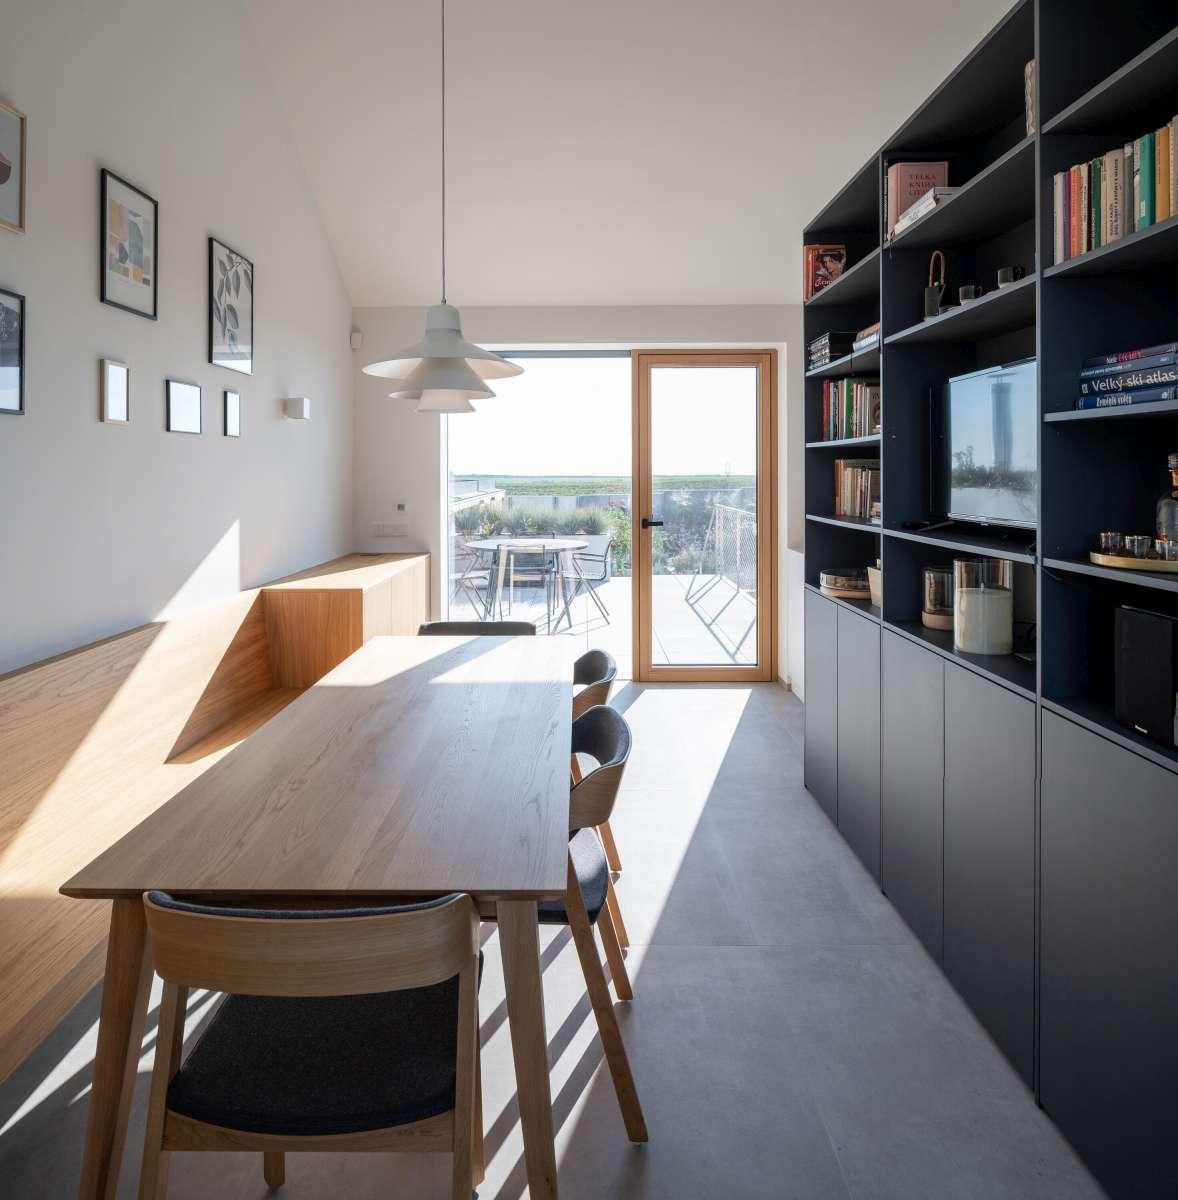 family house with atrium senaa alex shoots buildings 11 1200